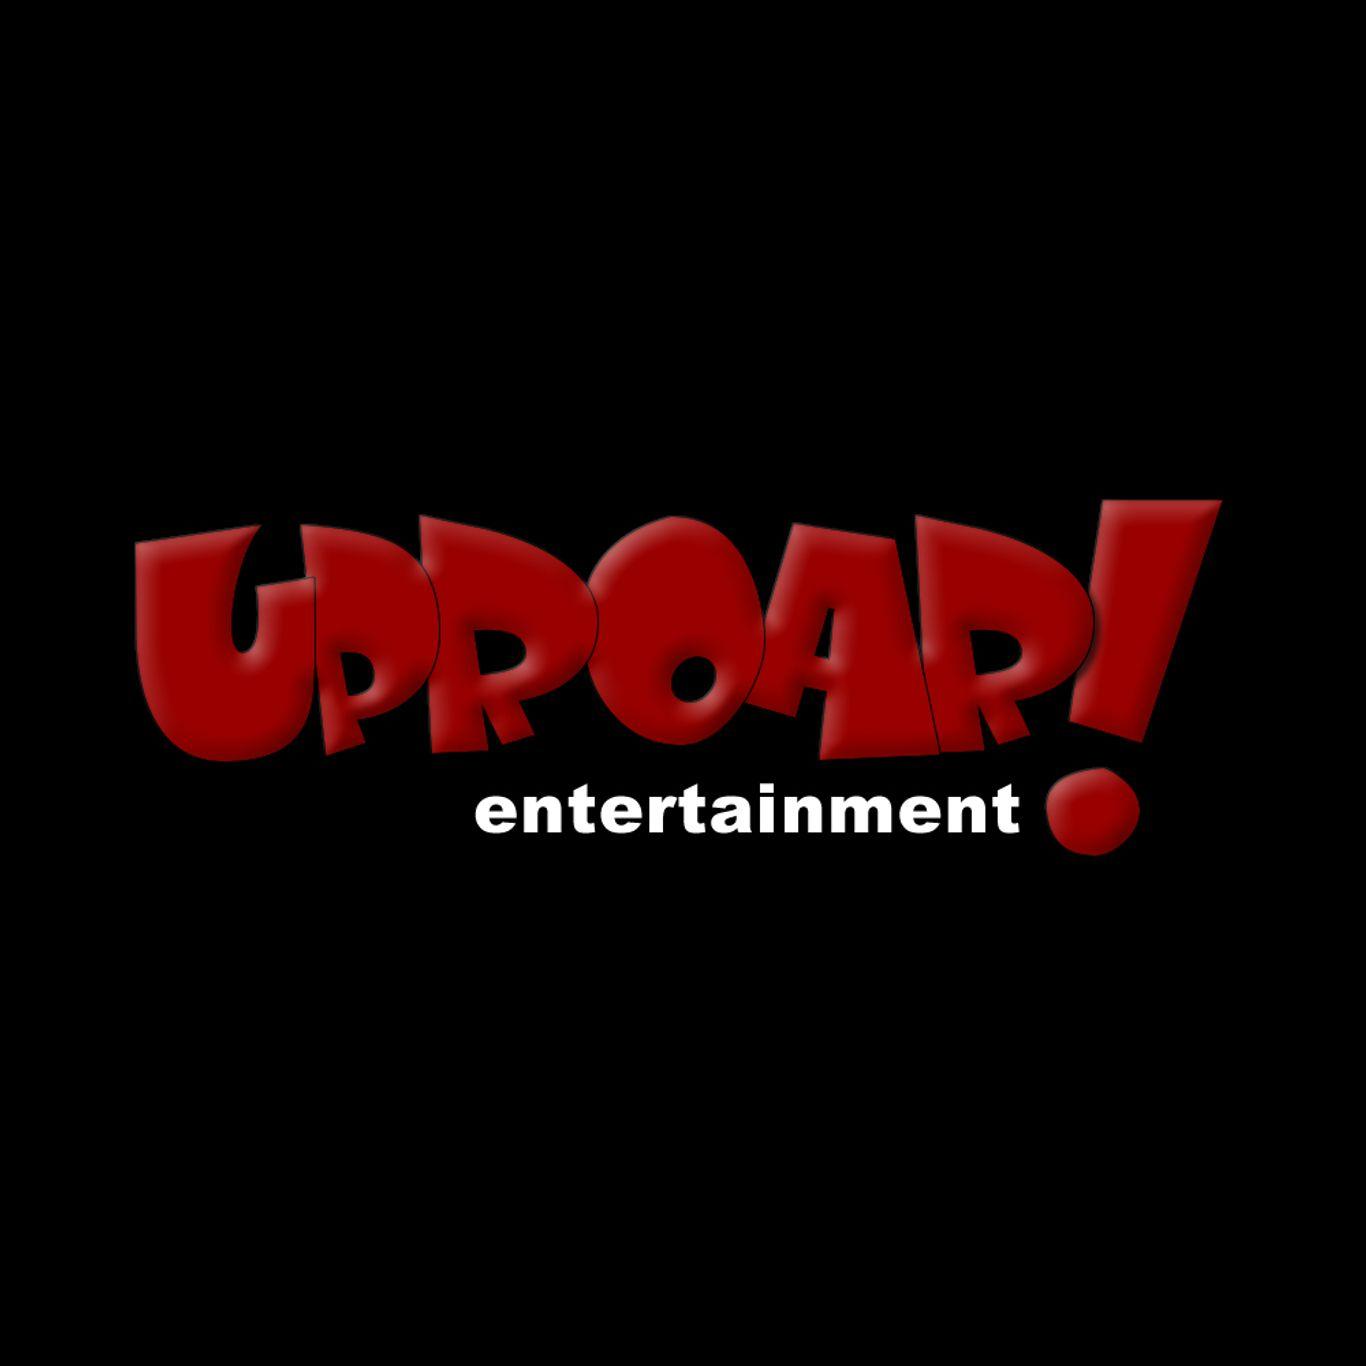 Uproar Entertainment